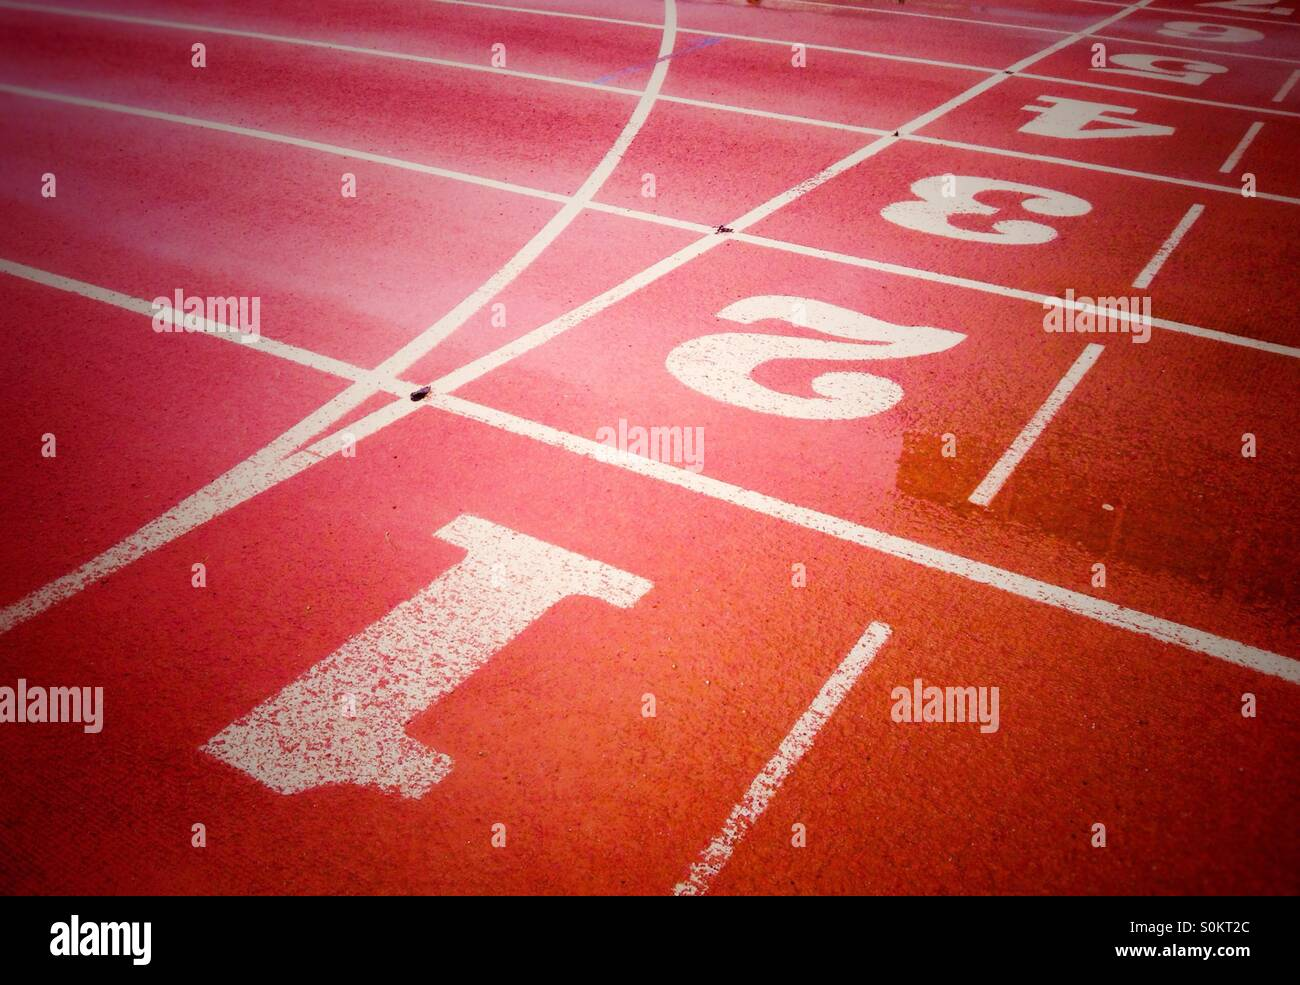 Running lanes of running track - Stock Image